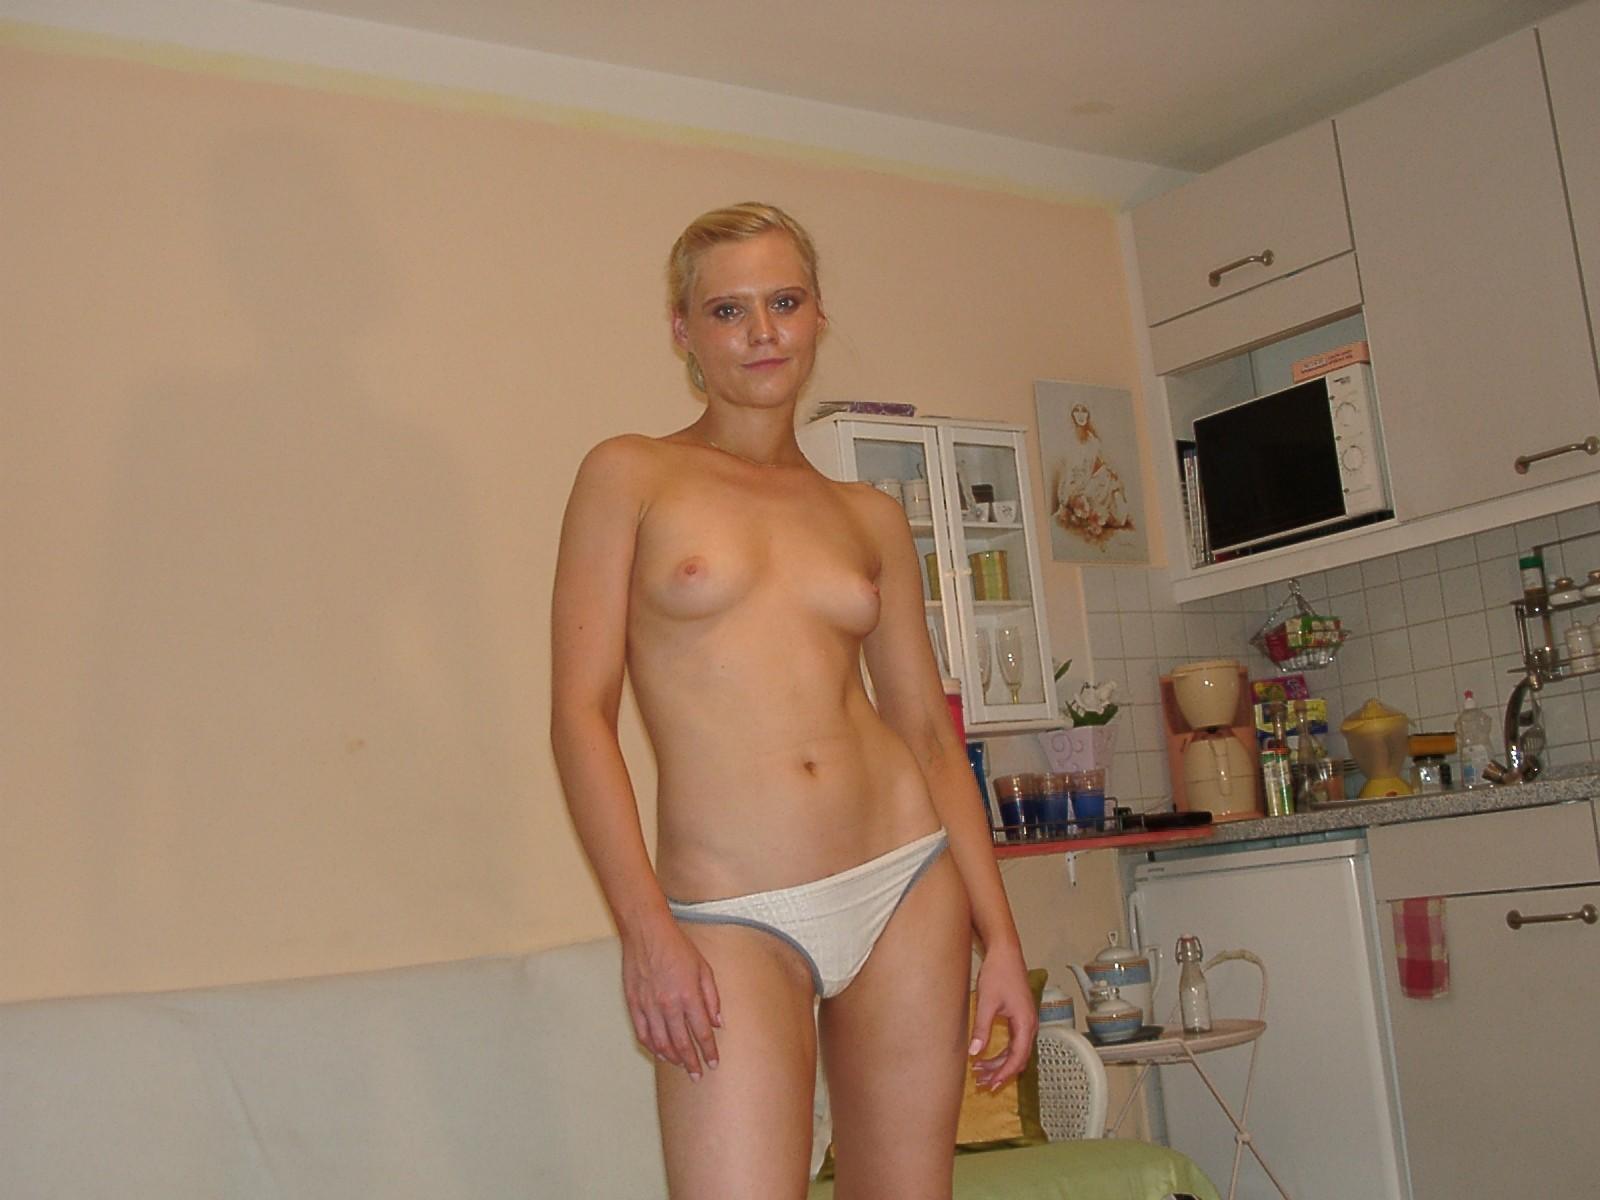 Широко раздвинув ноги, блондинка мастурбирует синим дилдо